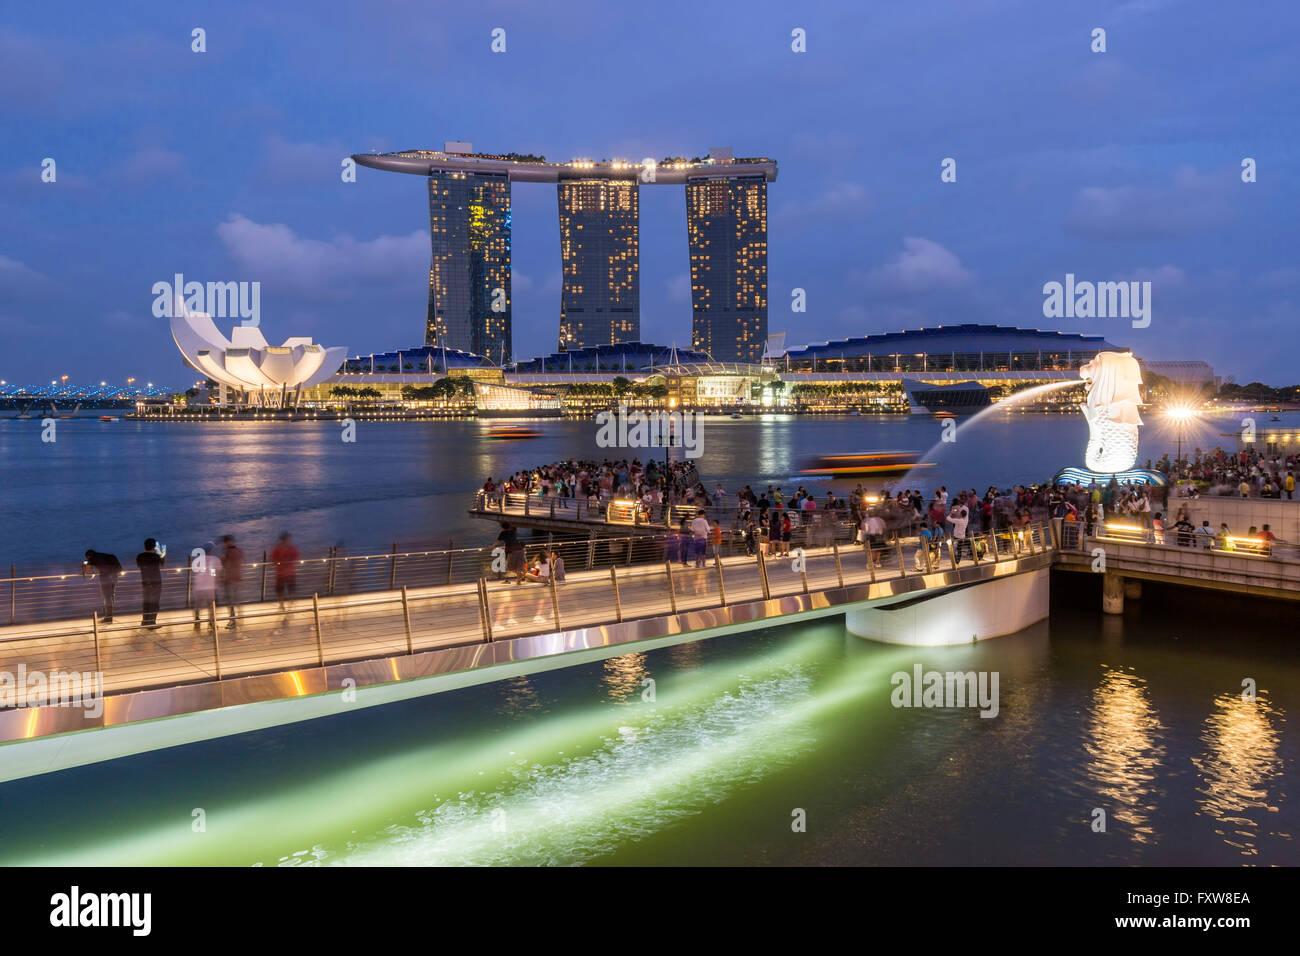 Marina Bay, Merlion, Marina Bay Sands Hotel, Pier, Singapore, Singapur, Southest Asia, travelstock44 Stock Photo